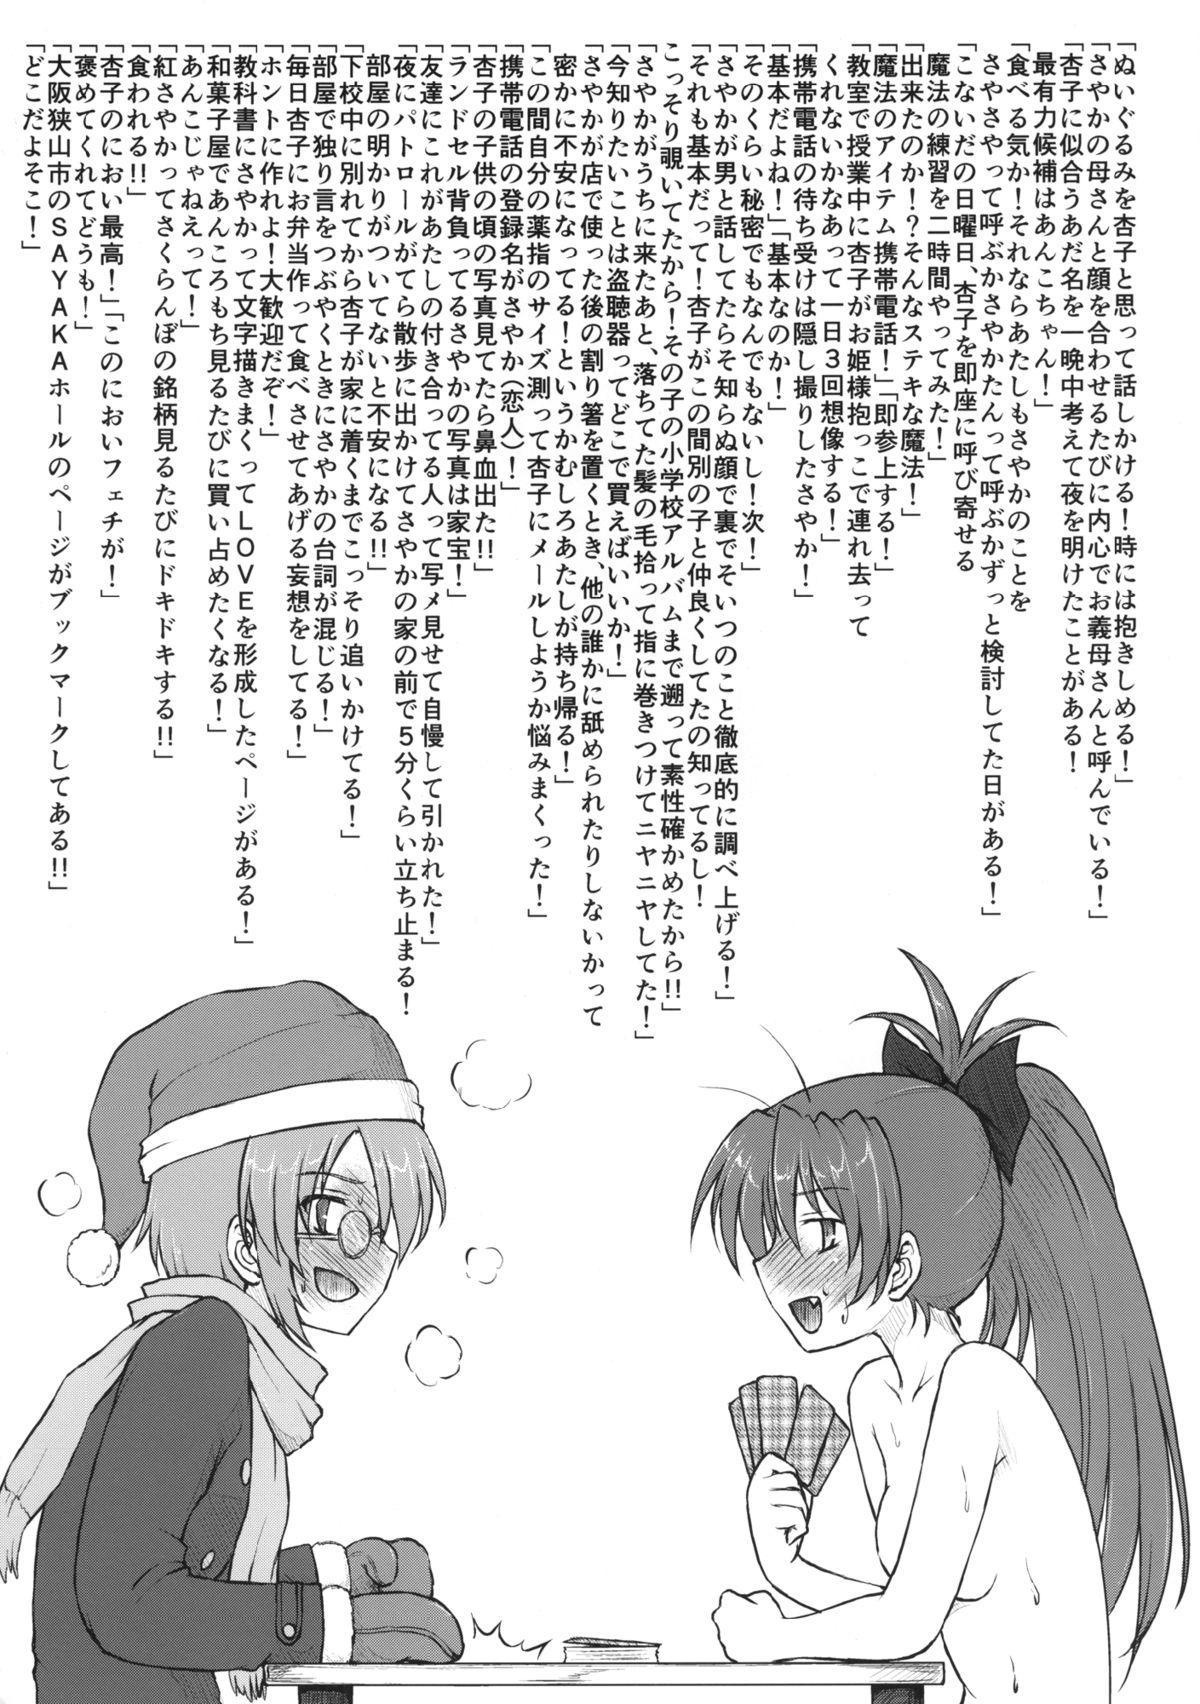 (SHT2013 Haru) [Newtype Kenkyuujo (Kotowari)] Sayaka-san to Kyouko-san (Puella Magi Madoka Magica) 23